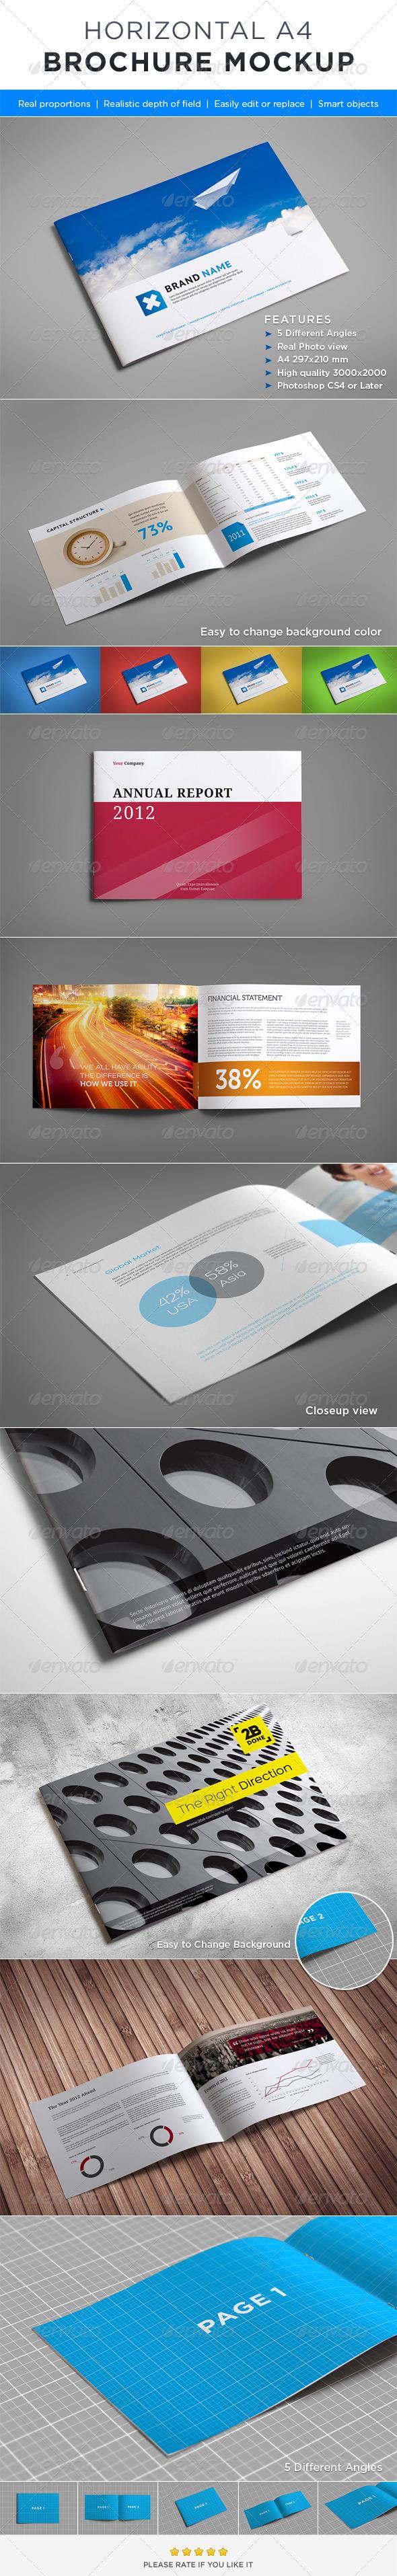 Horizontal Brochure Mock-up